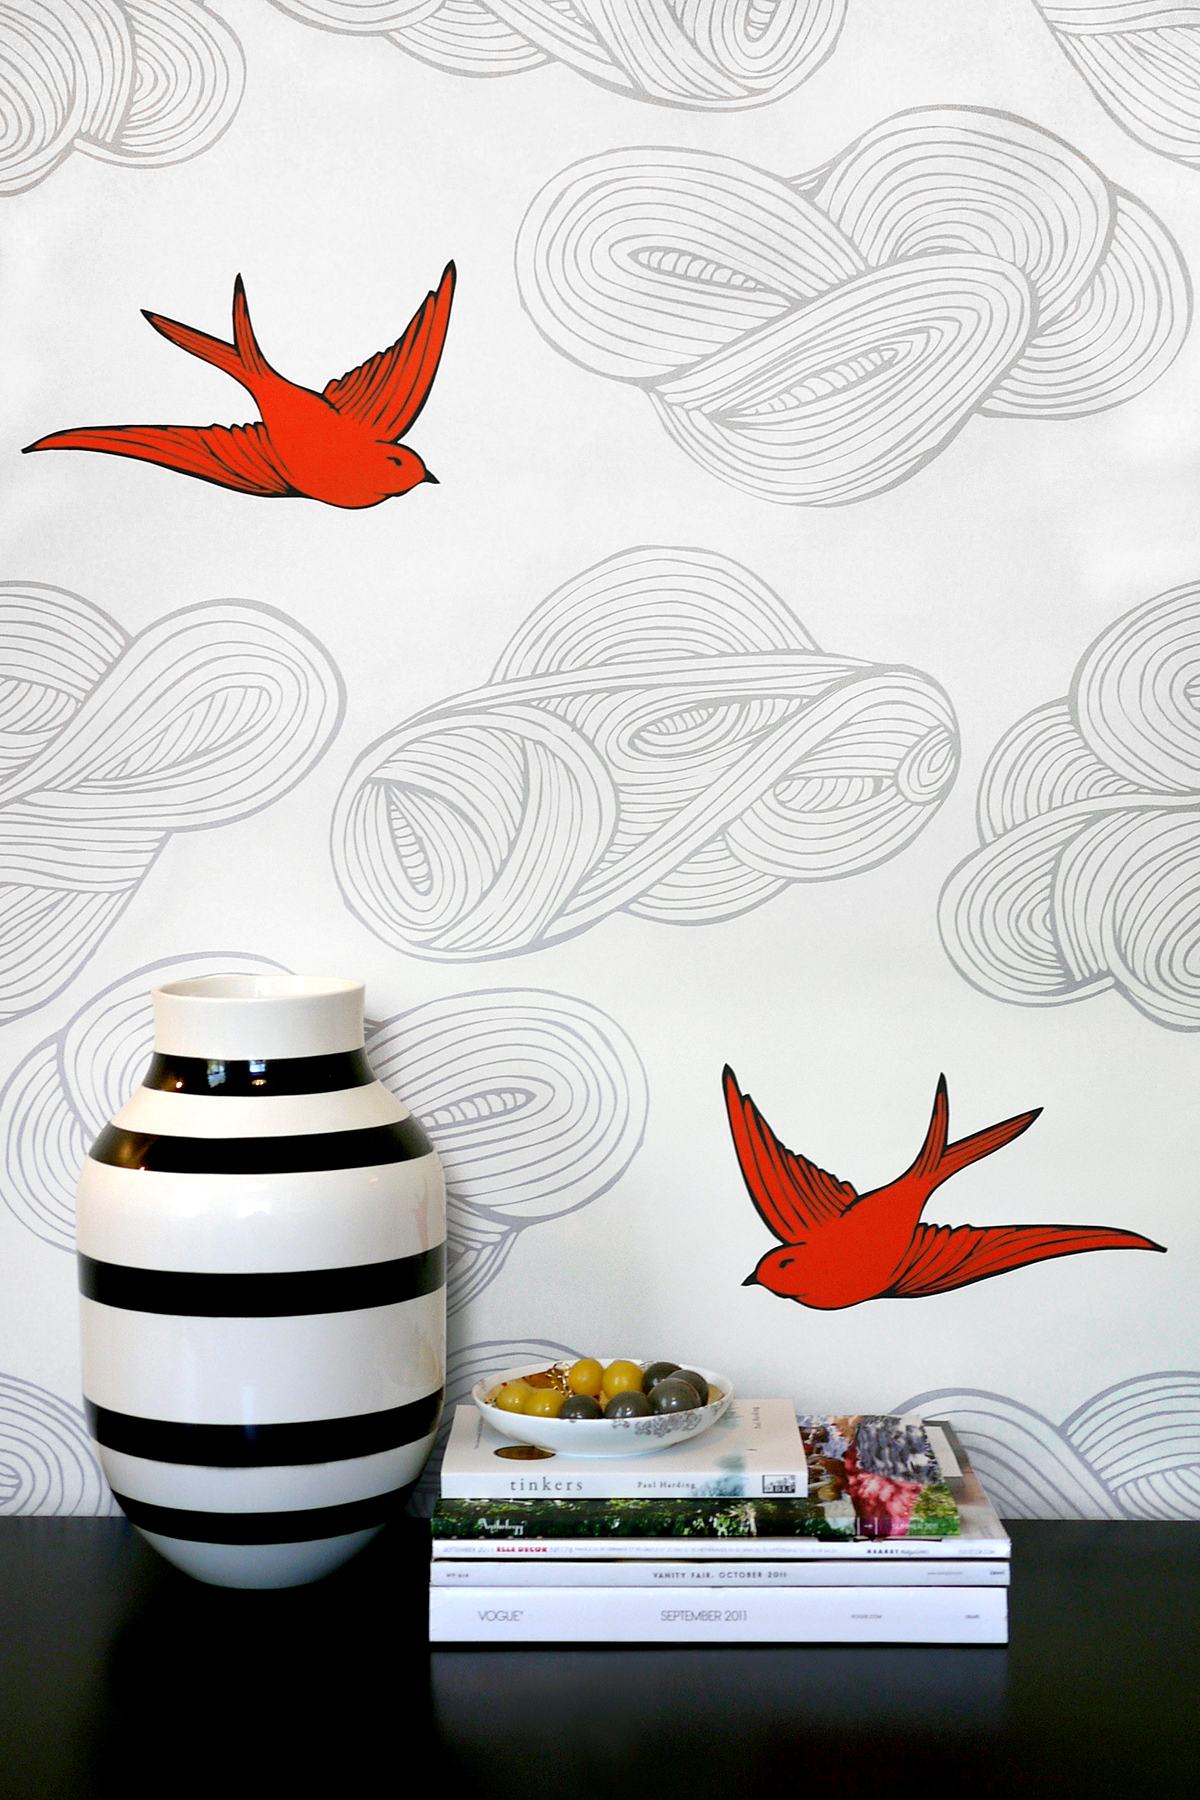 julia rothman wallpaper wallpapersafari. Black Bedroom Furniture Sets. Home Design Ideas